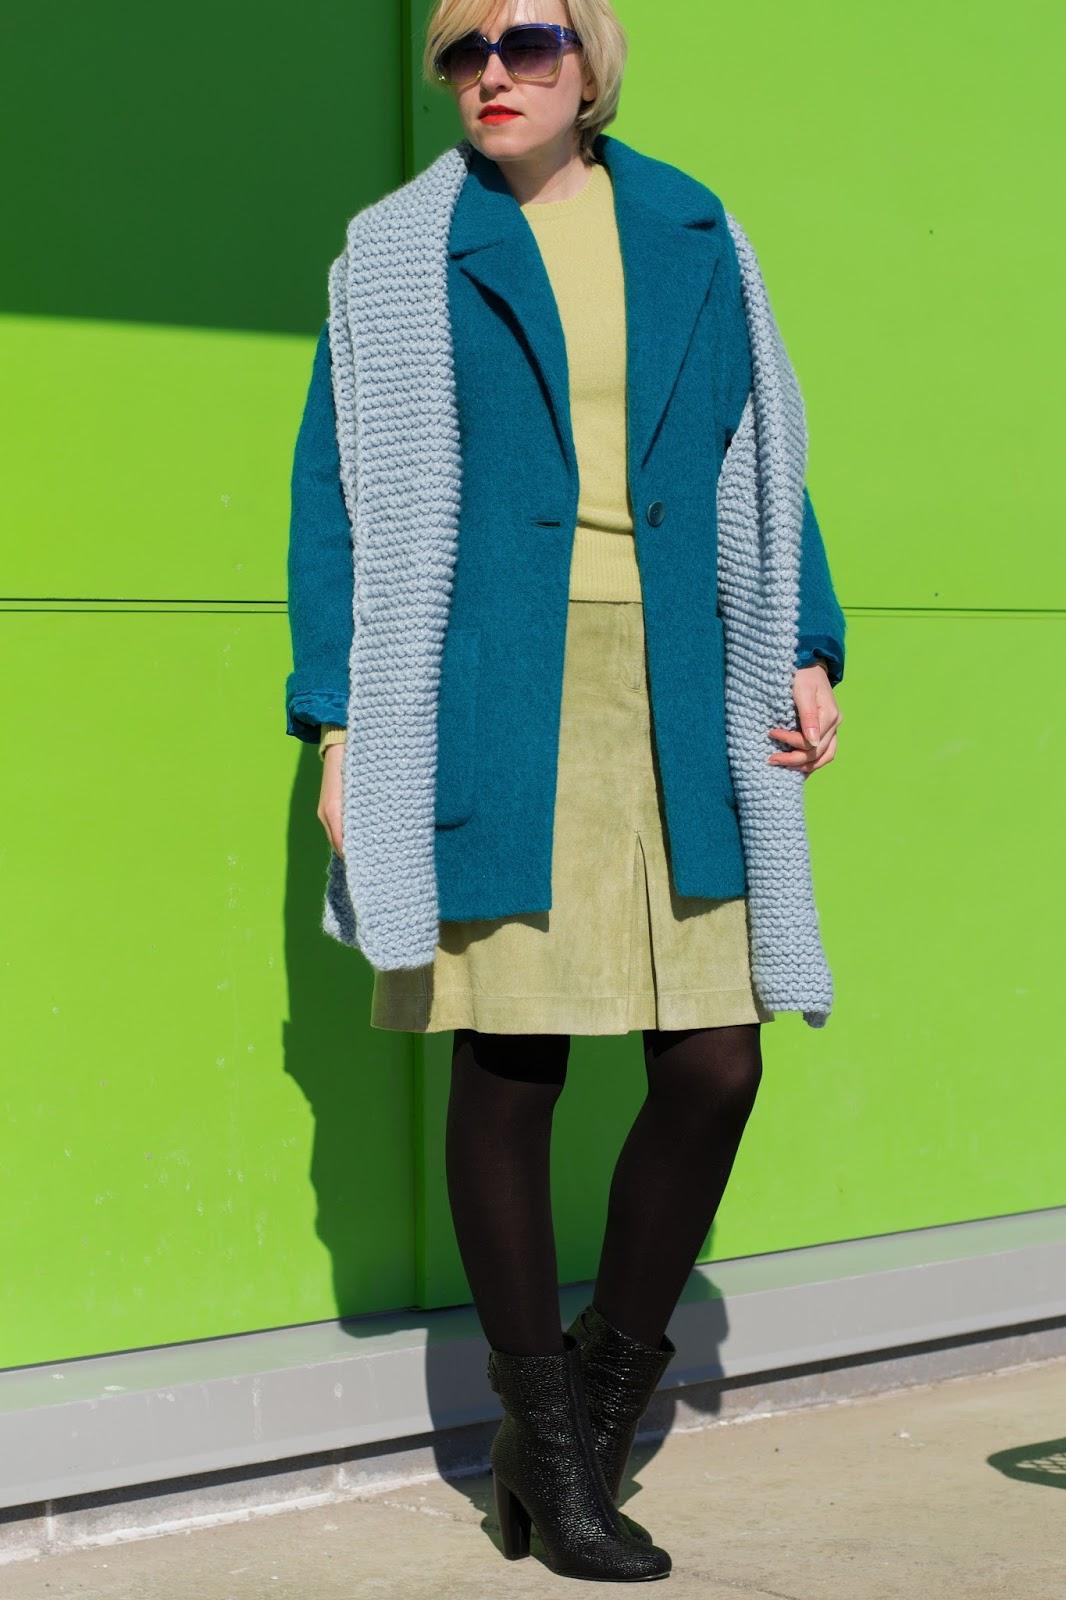 pistachio green sweater